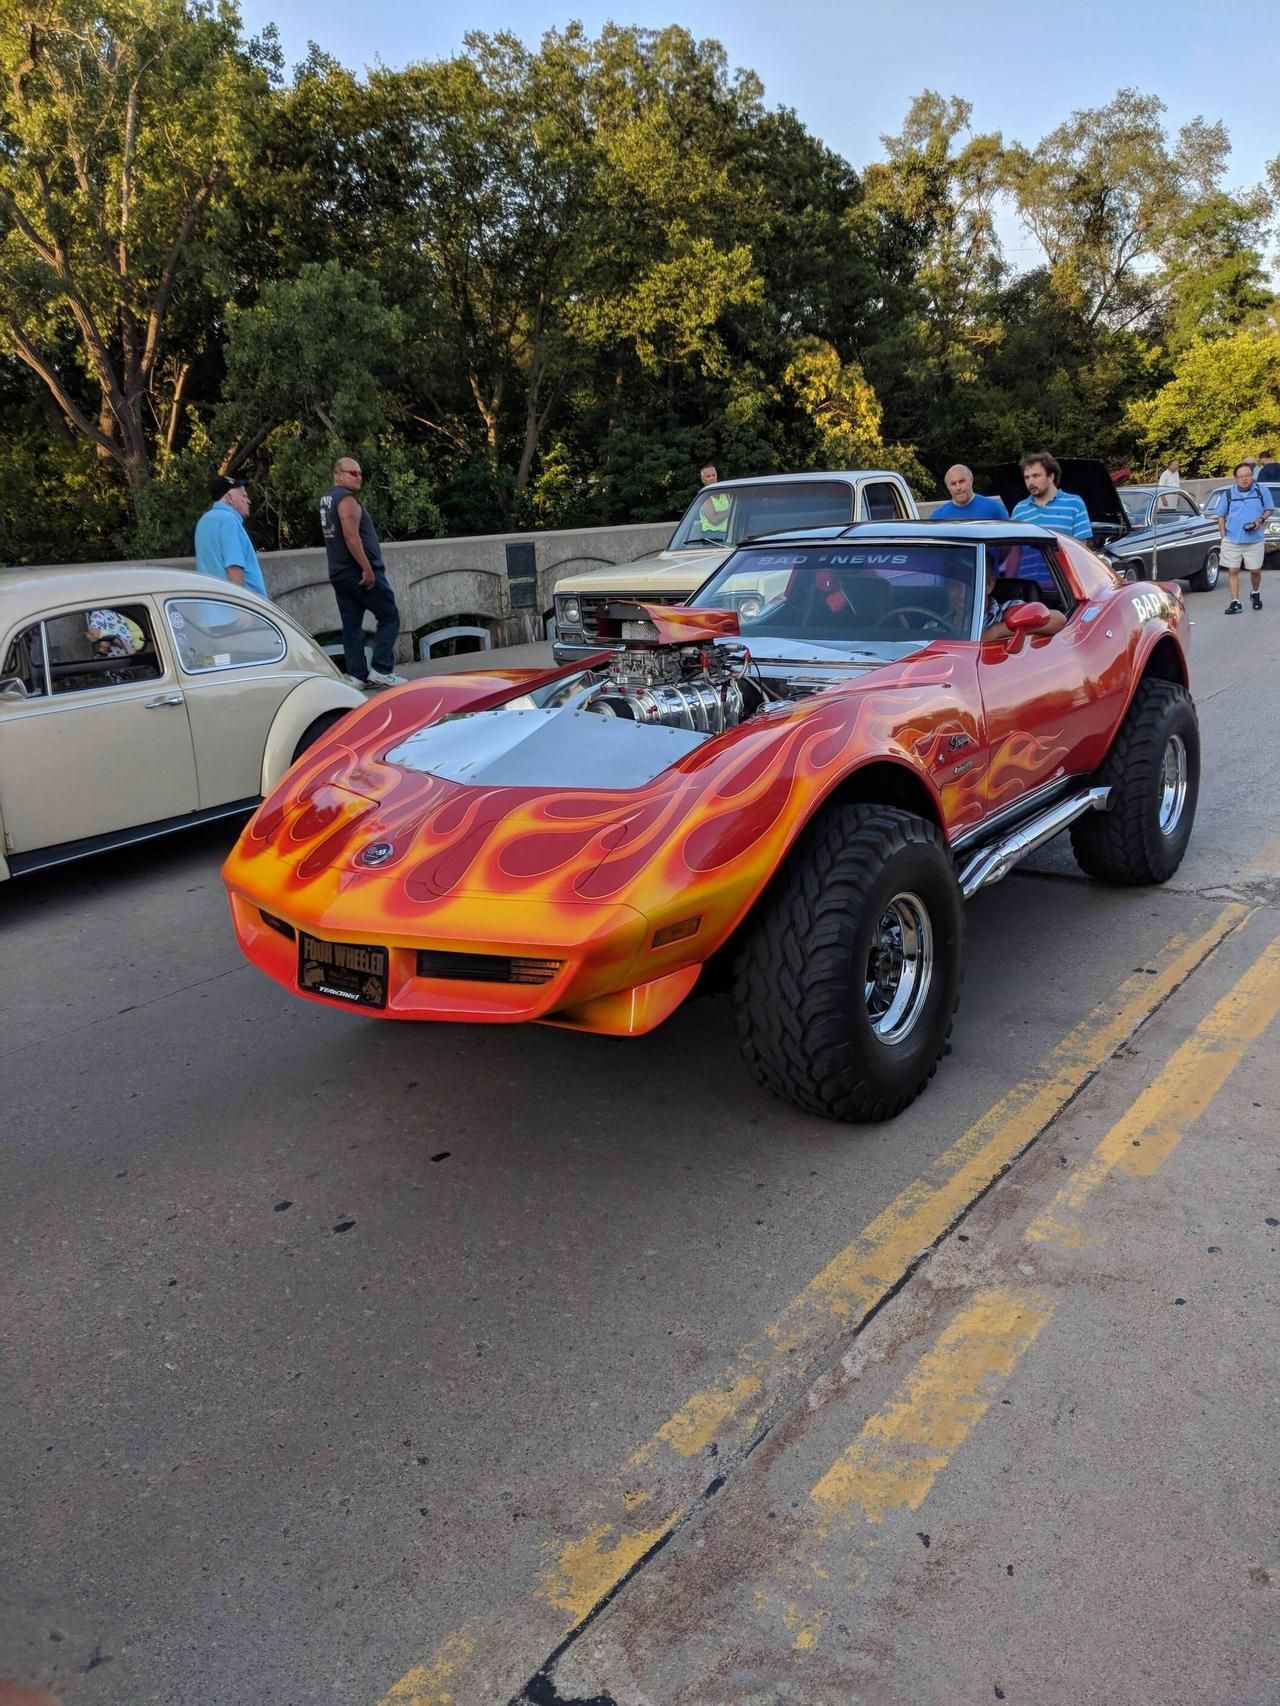 Bad News C3 Corvette 4x4 Corvette 4x4 Chevrolet Corvette